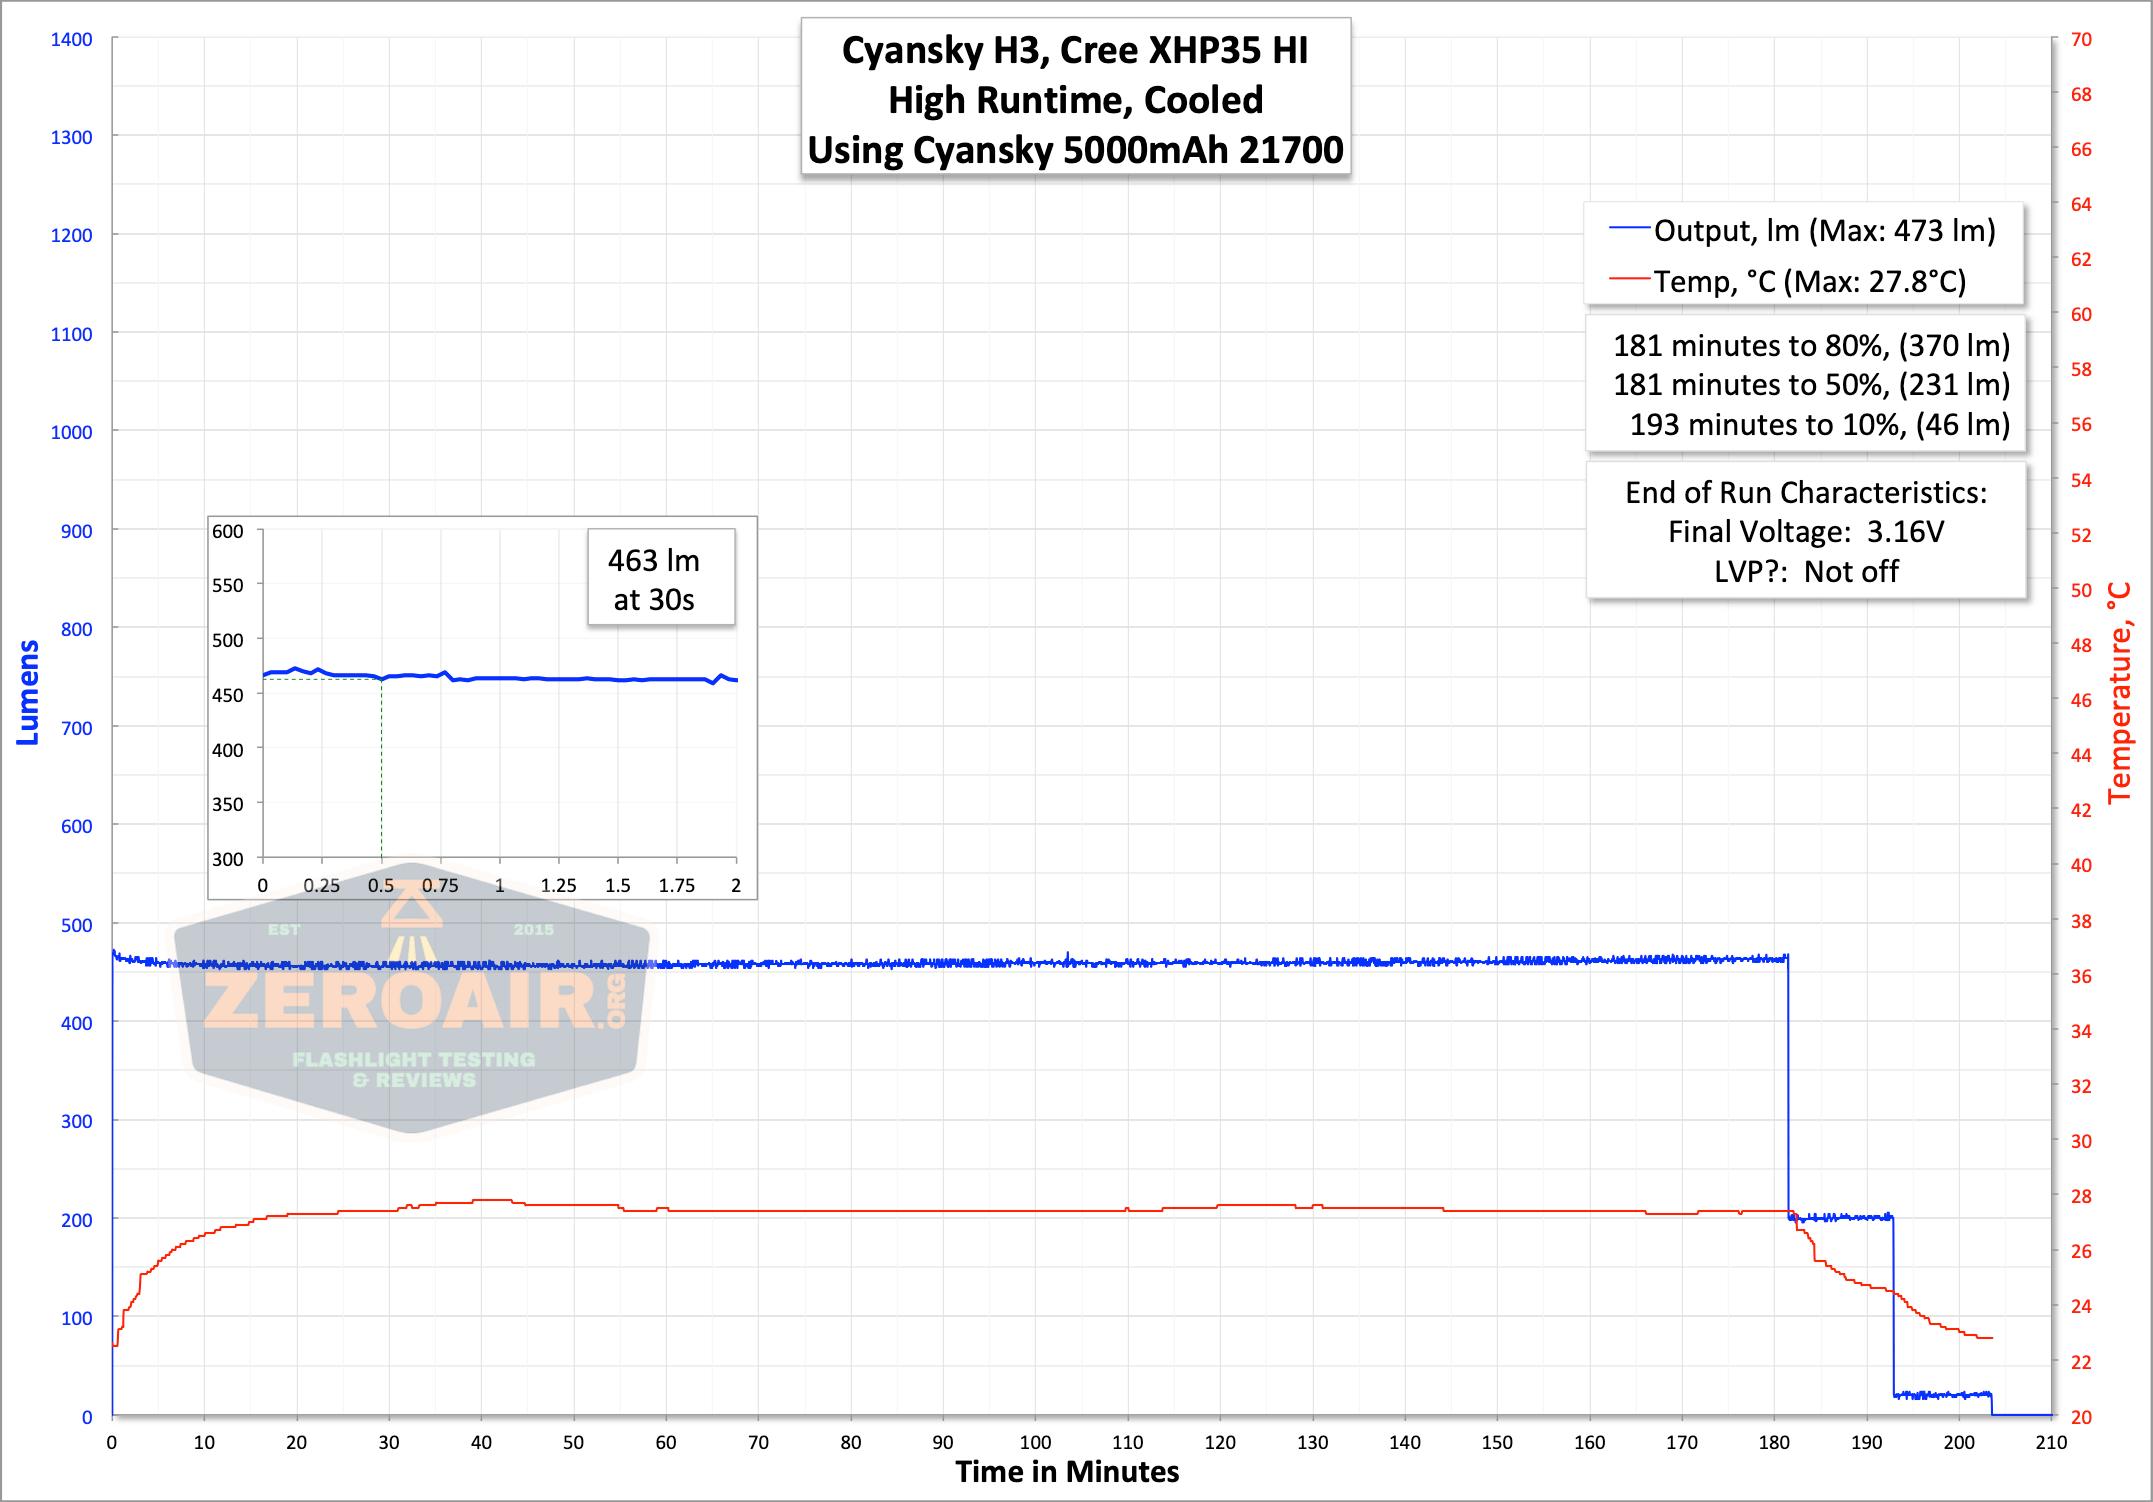 cyansky h3 21700 runtime high